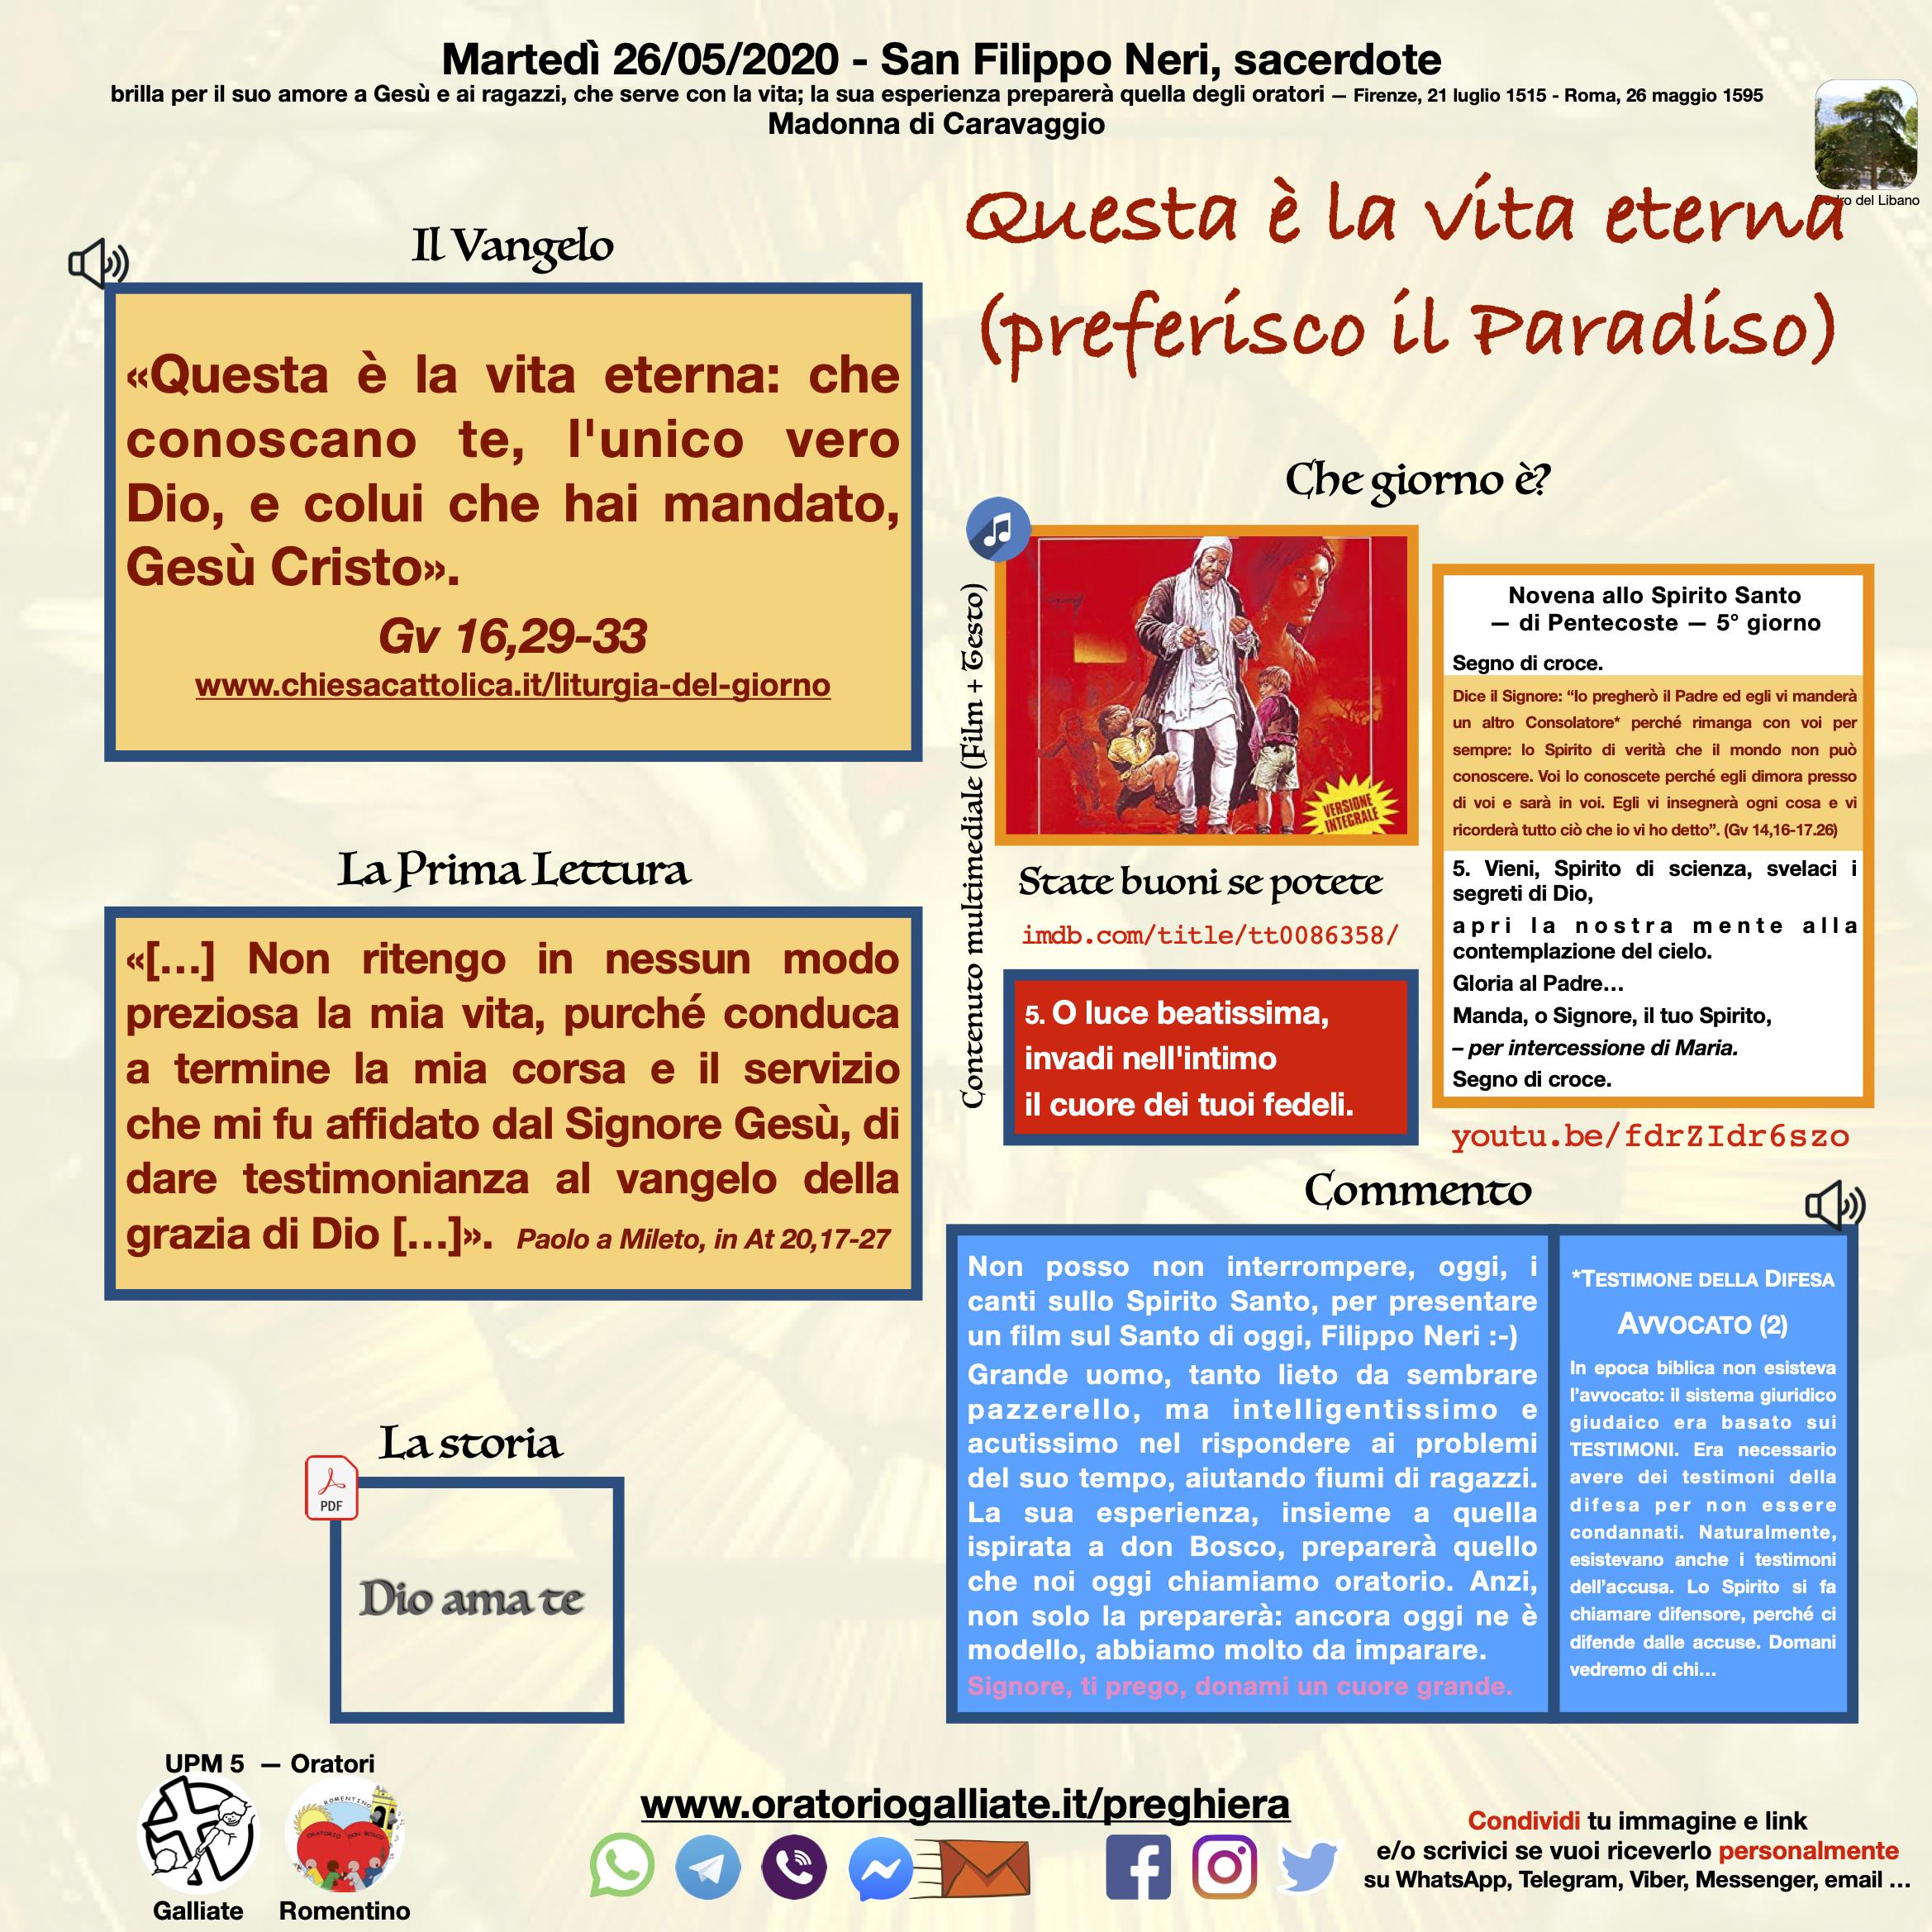 "Prg200526-Pasqua"" width="